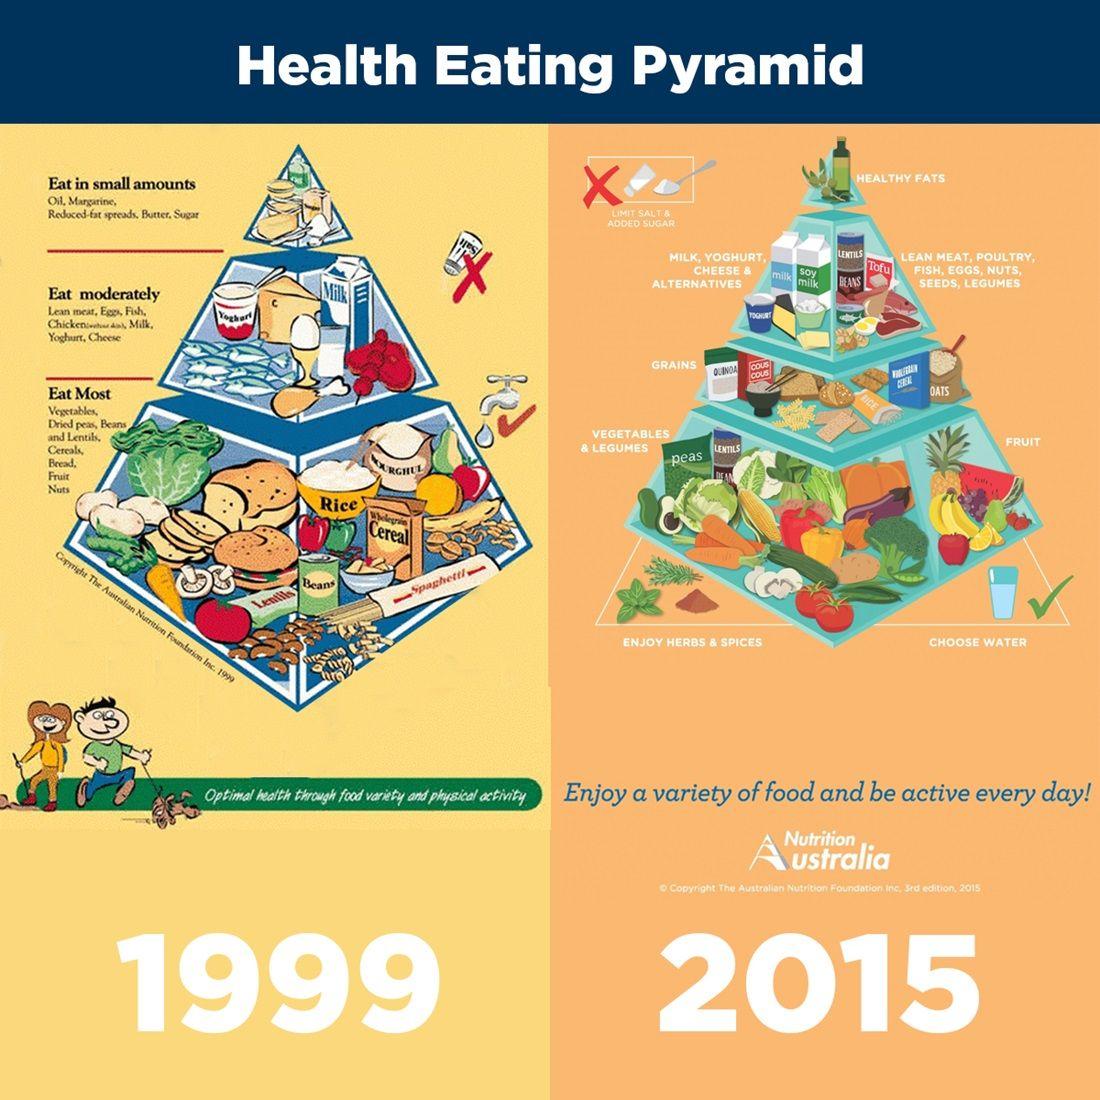 Health Eating Pyramid To